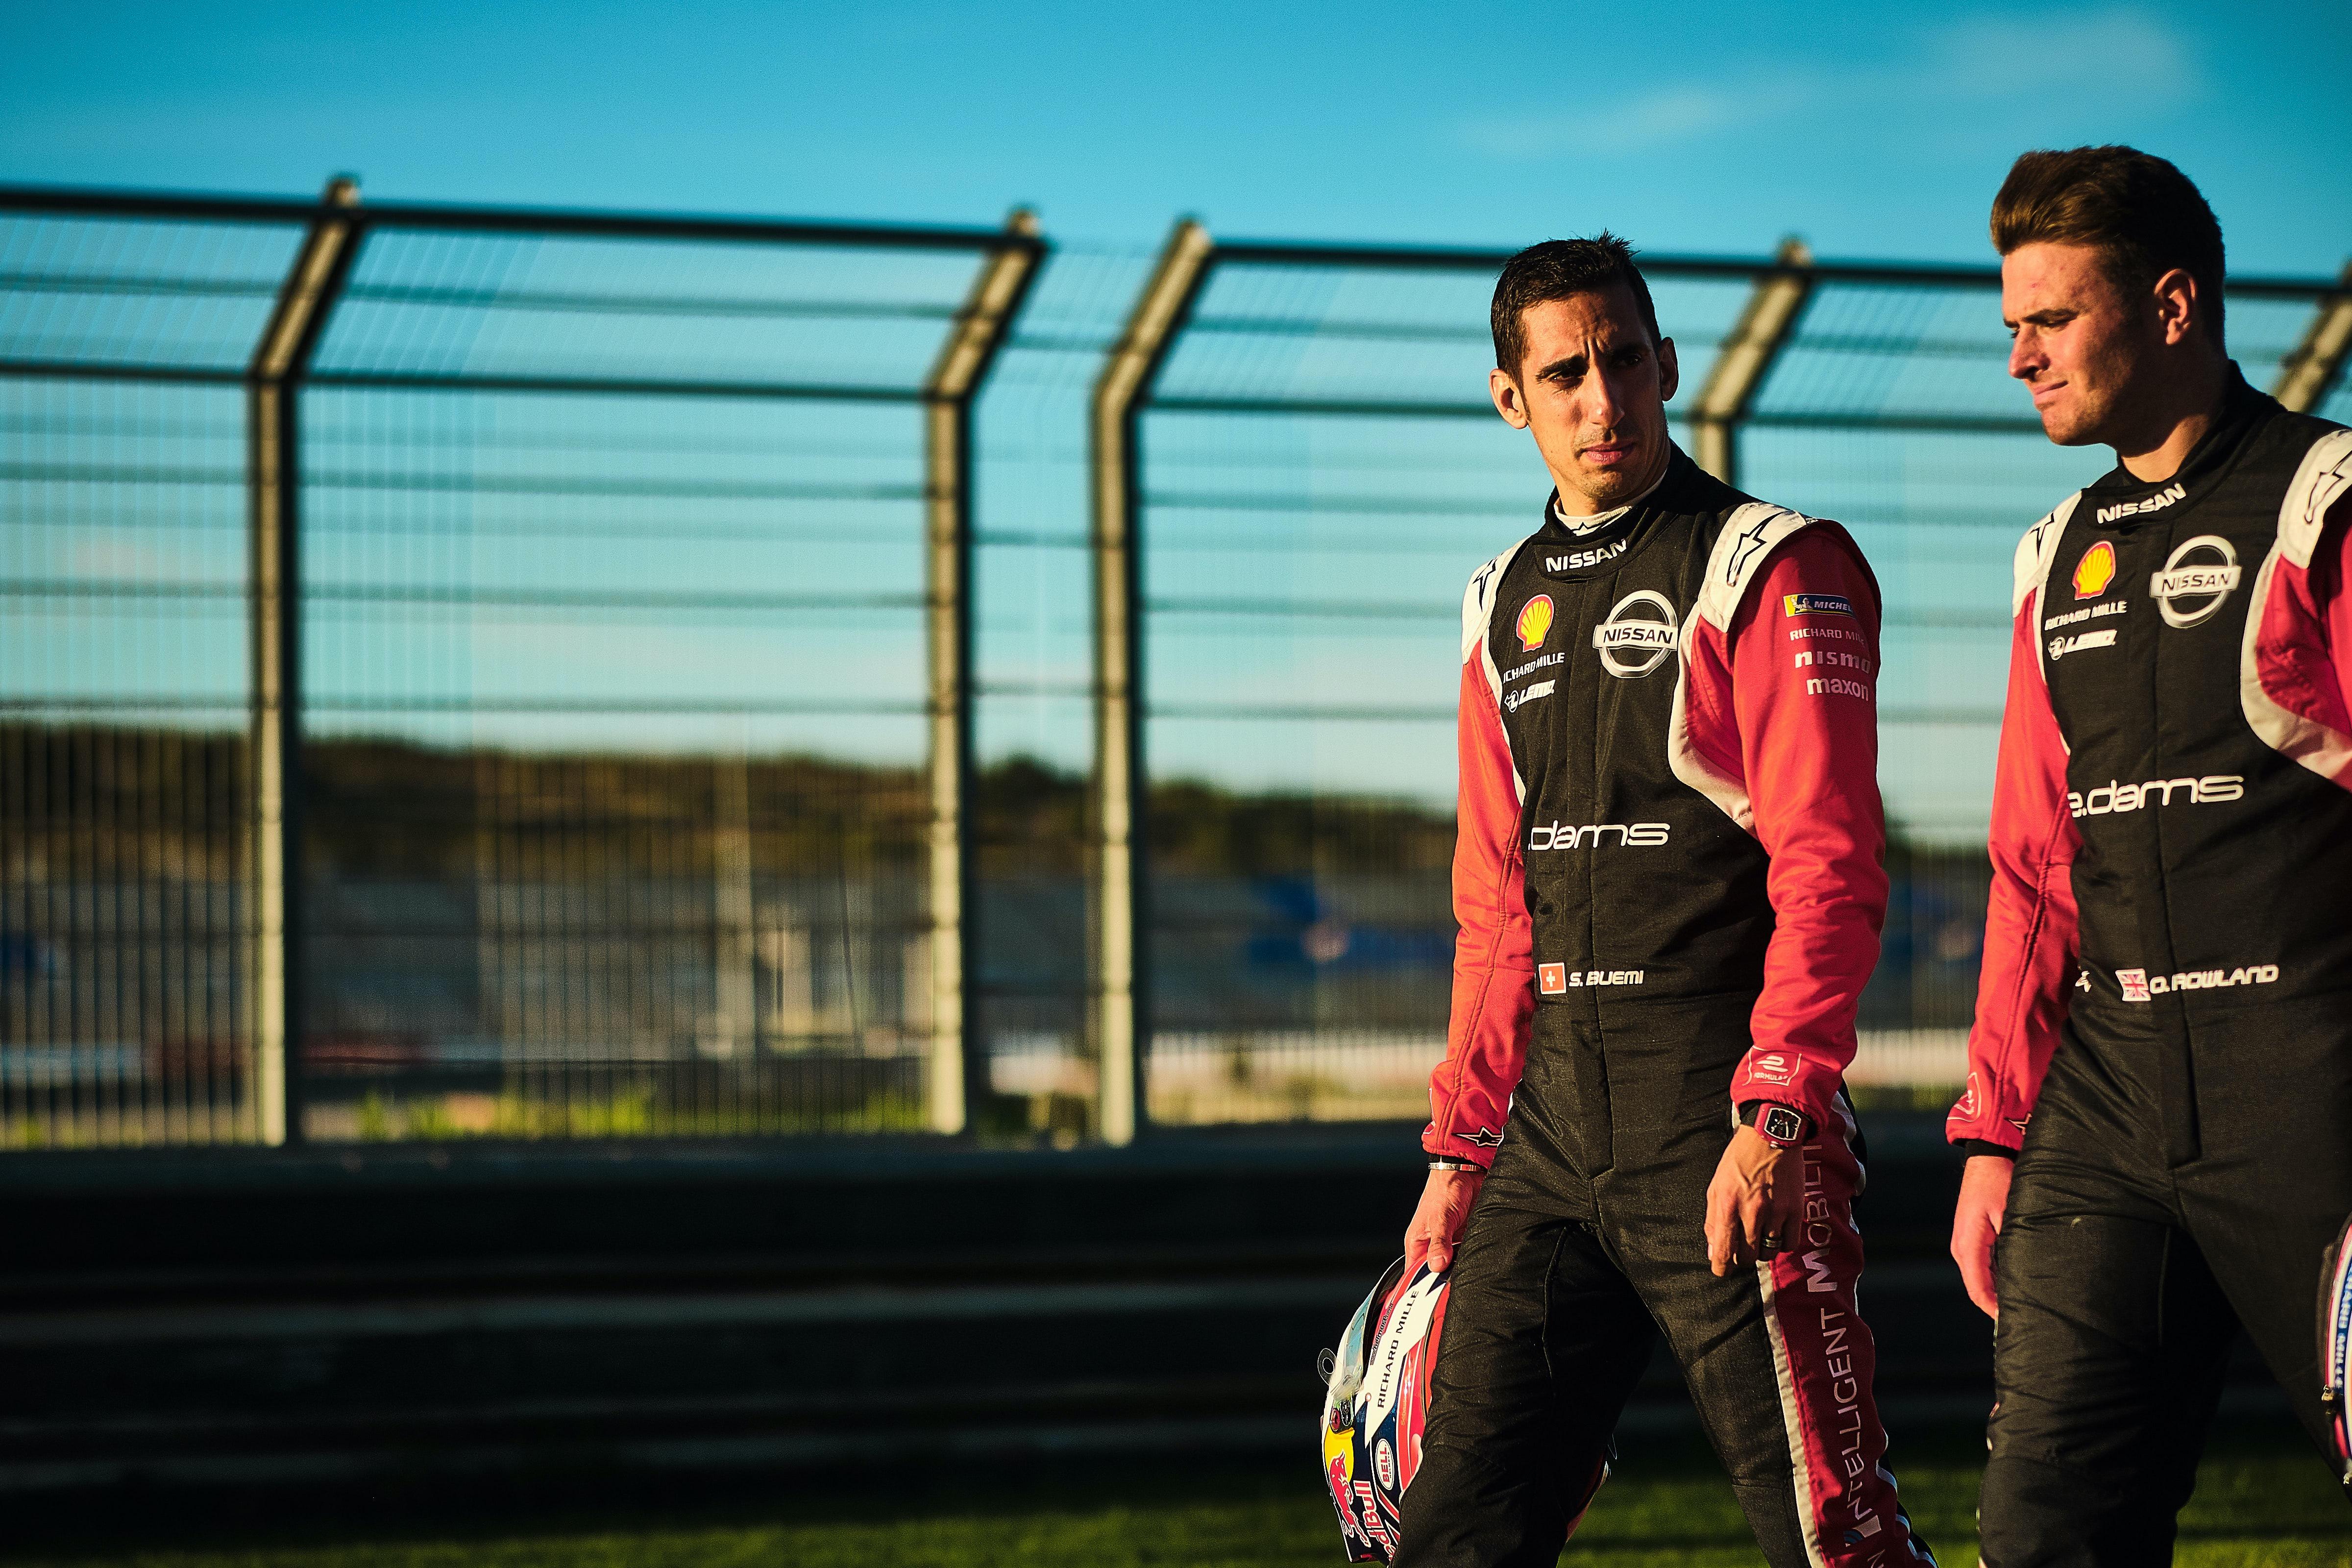 Oliver Rowland, Sebastien Buemi, Nissan edams, Formula E